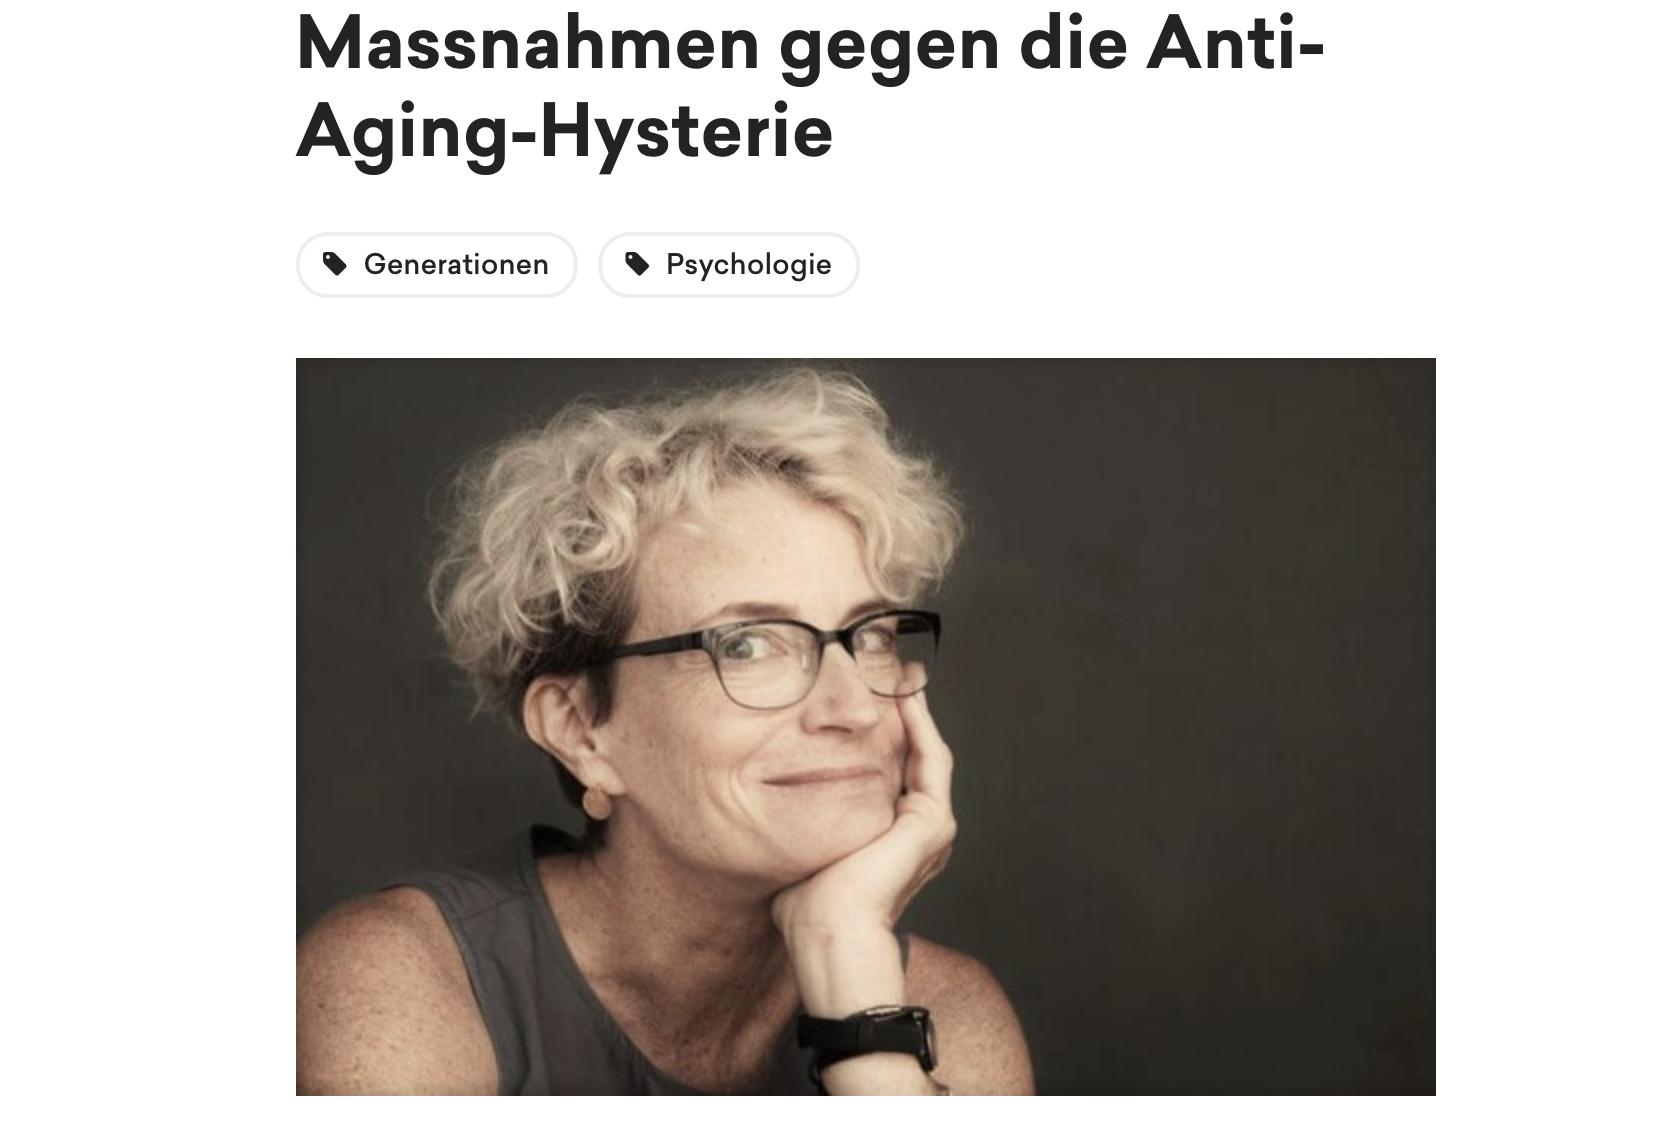 article in Neustarter magazine (German)